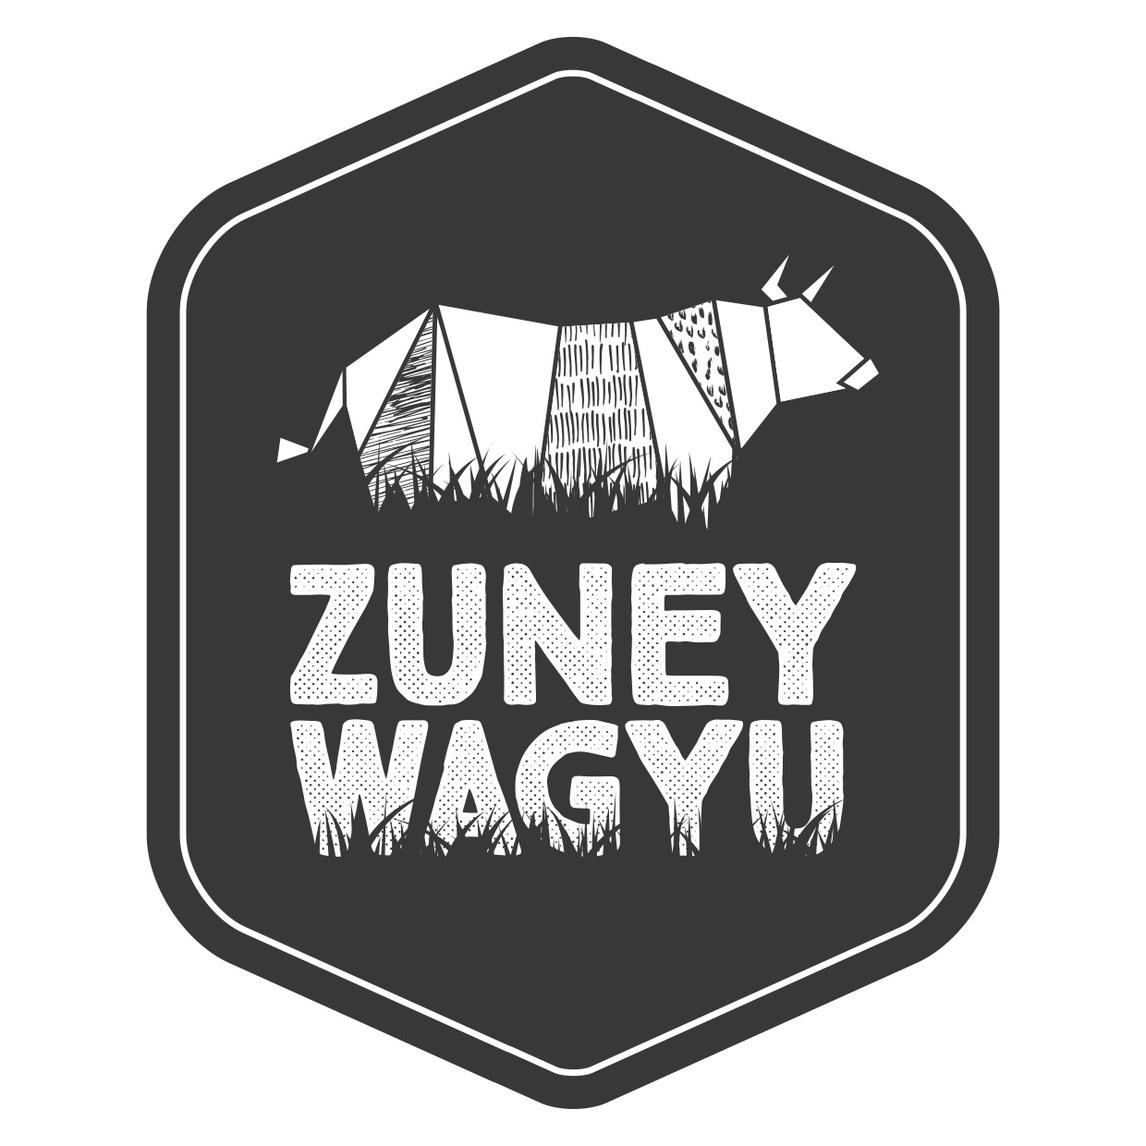 Zuney Wagyu